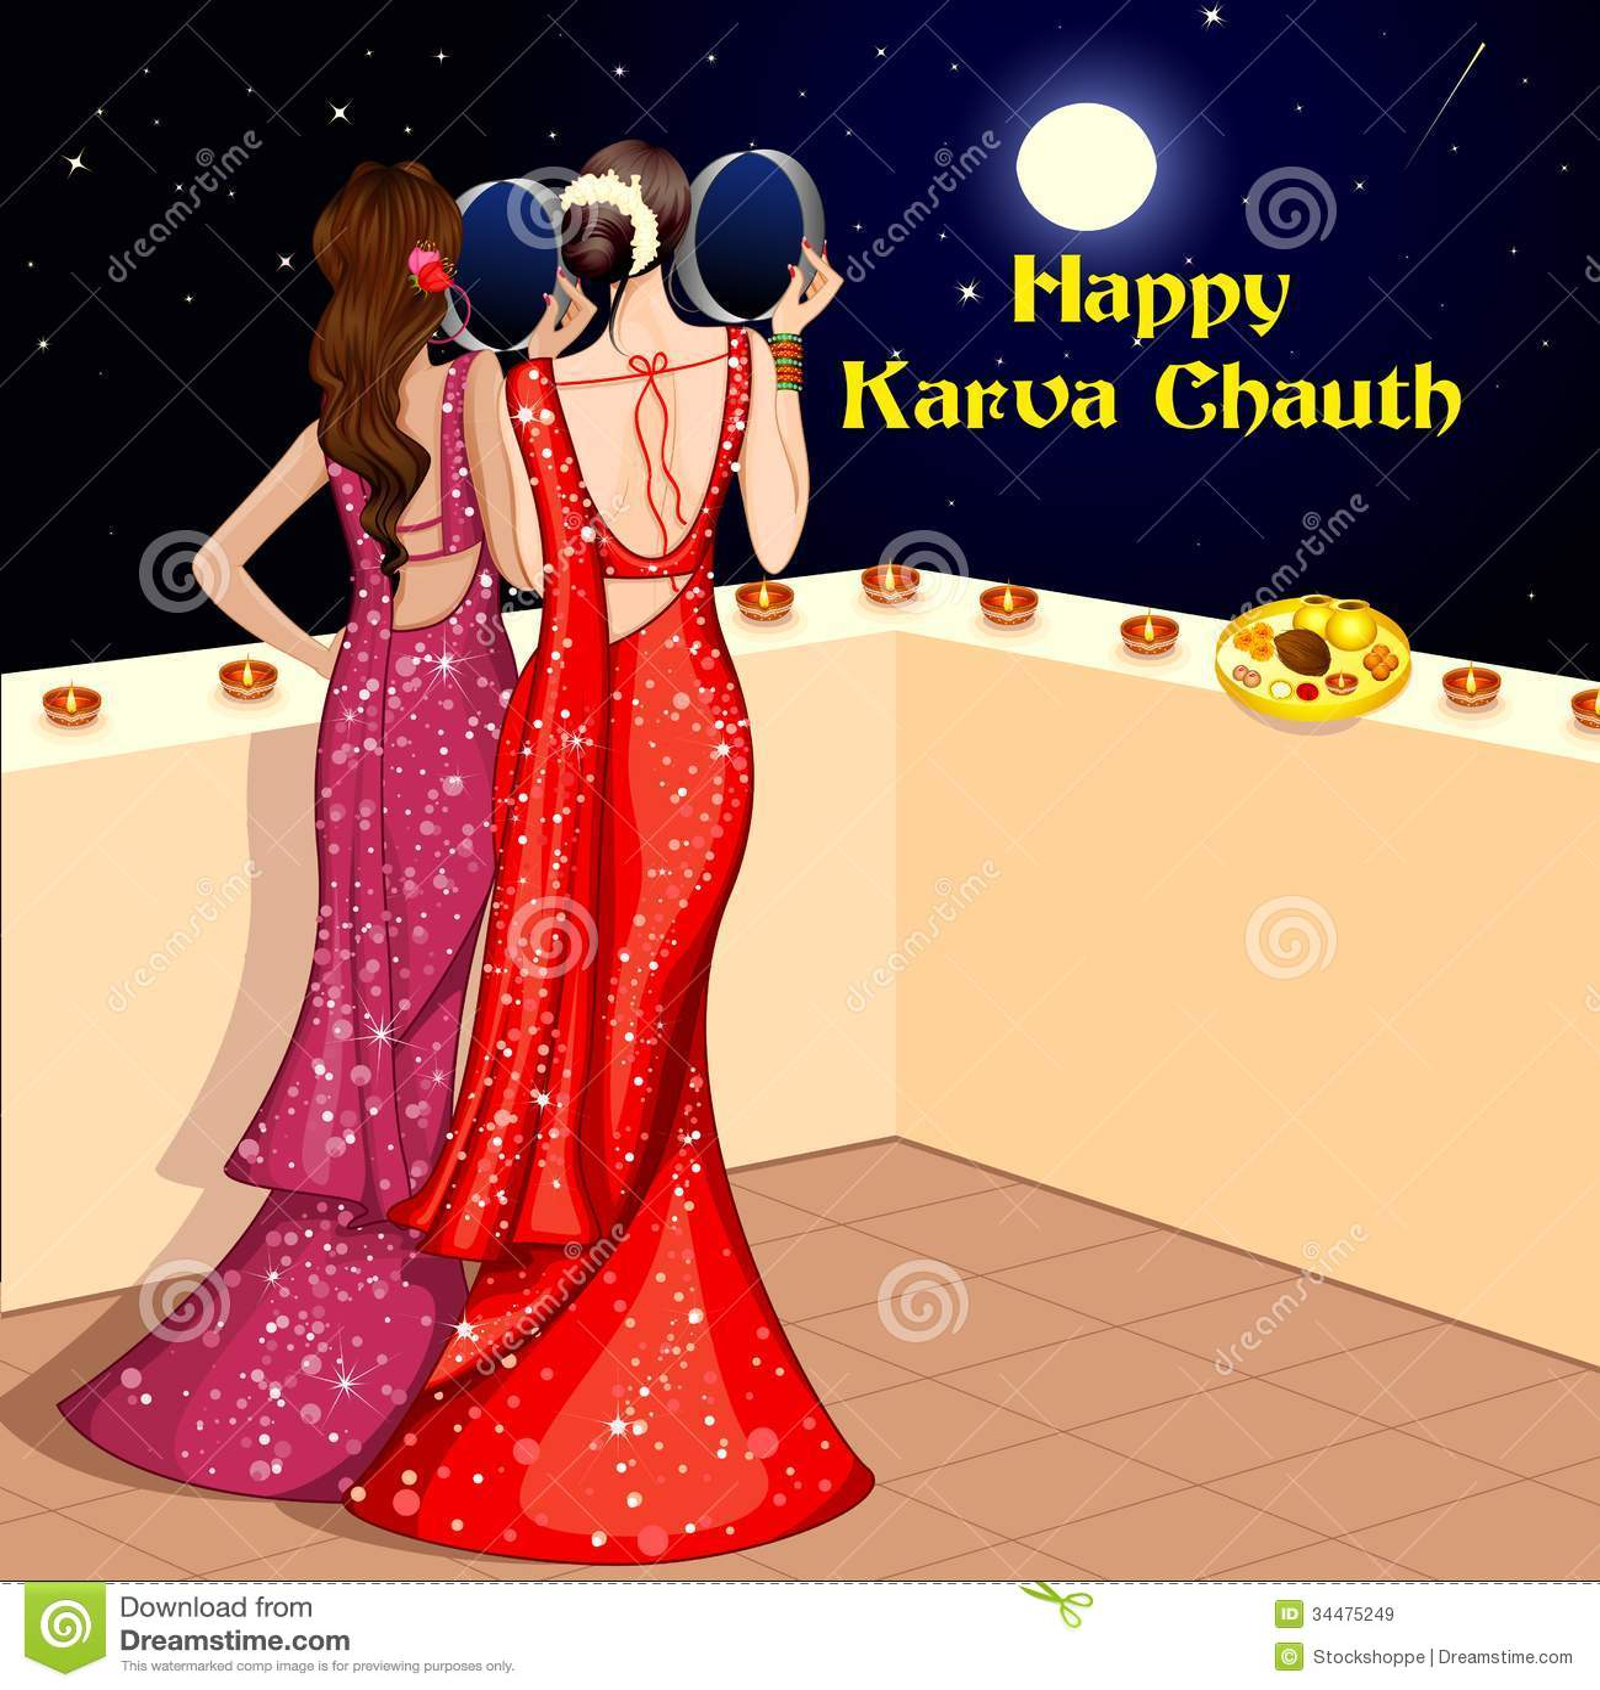 Diya Wallpaper Hd Indian Lady Celebrating Karwa Chauth Royalty Free Stock